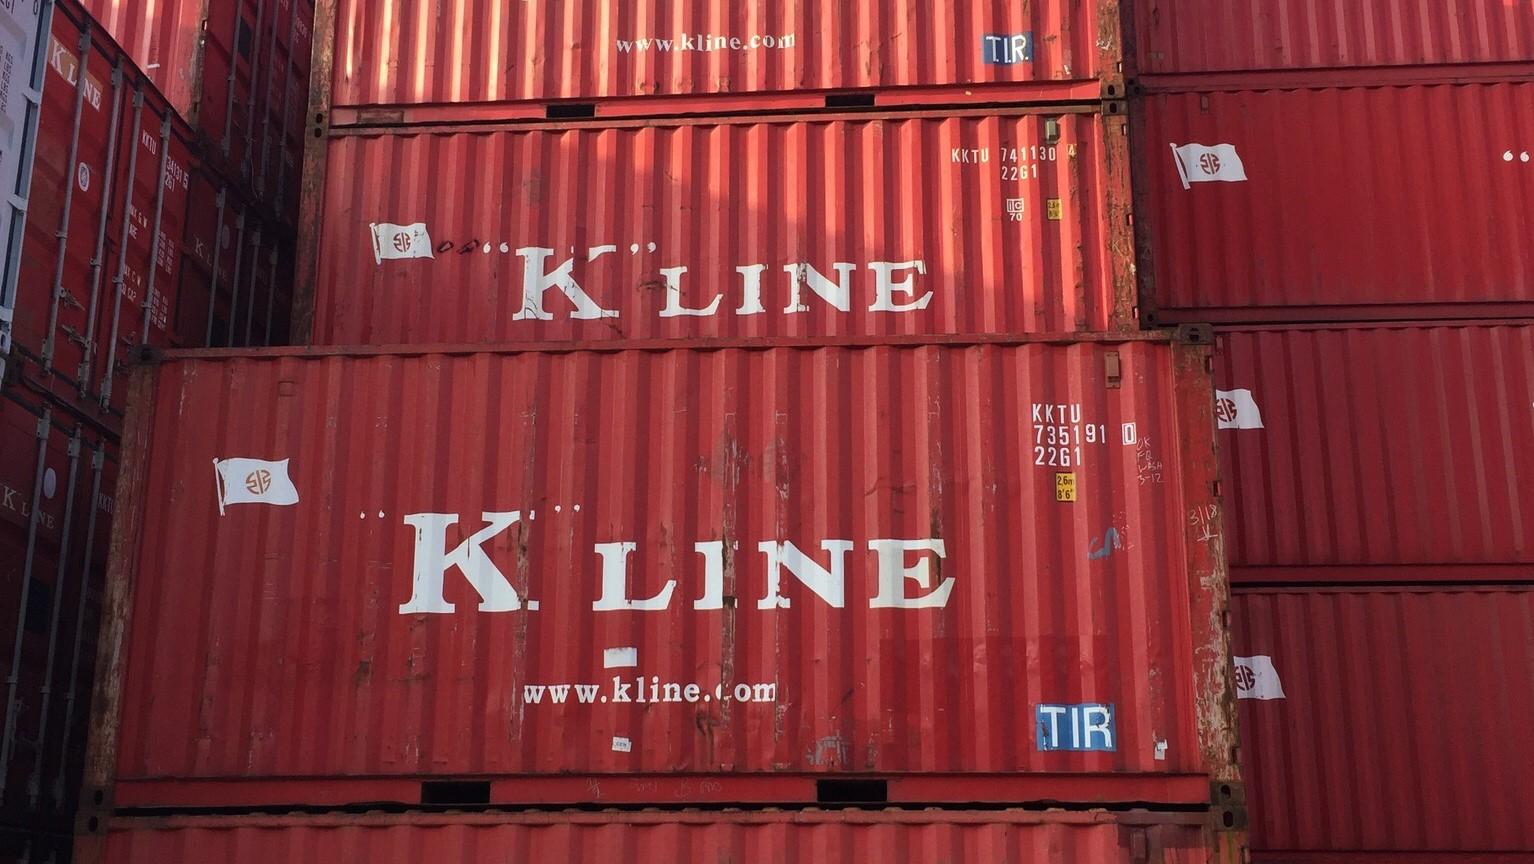 K Line starts structural reform as huge losses reported 1